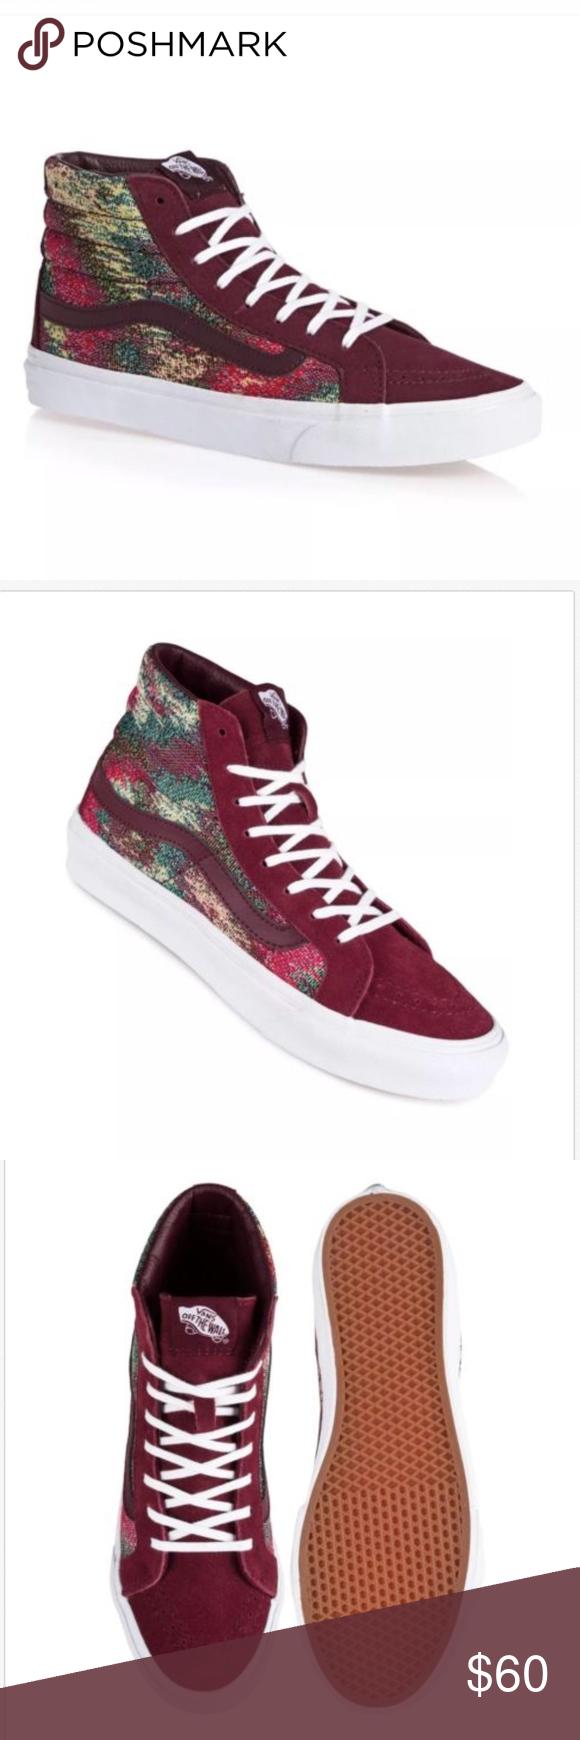 99d0e7b9f5 Vans Sk8 Hi Slim Italian Weave Port Royale Red Vans Sk8 Hi Slim Italian  Weave Port Royale Red Shoes Size Mens 7.0 Women 8.5 Brand New In Box Vans  Shoes ...